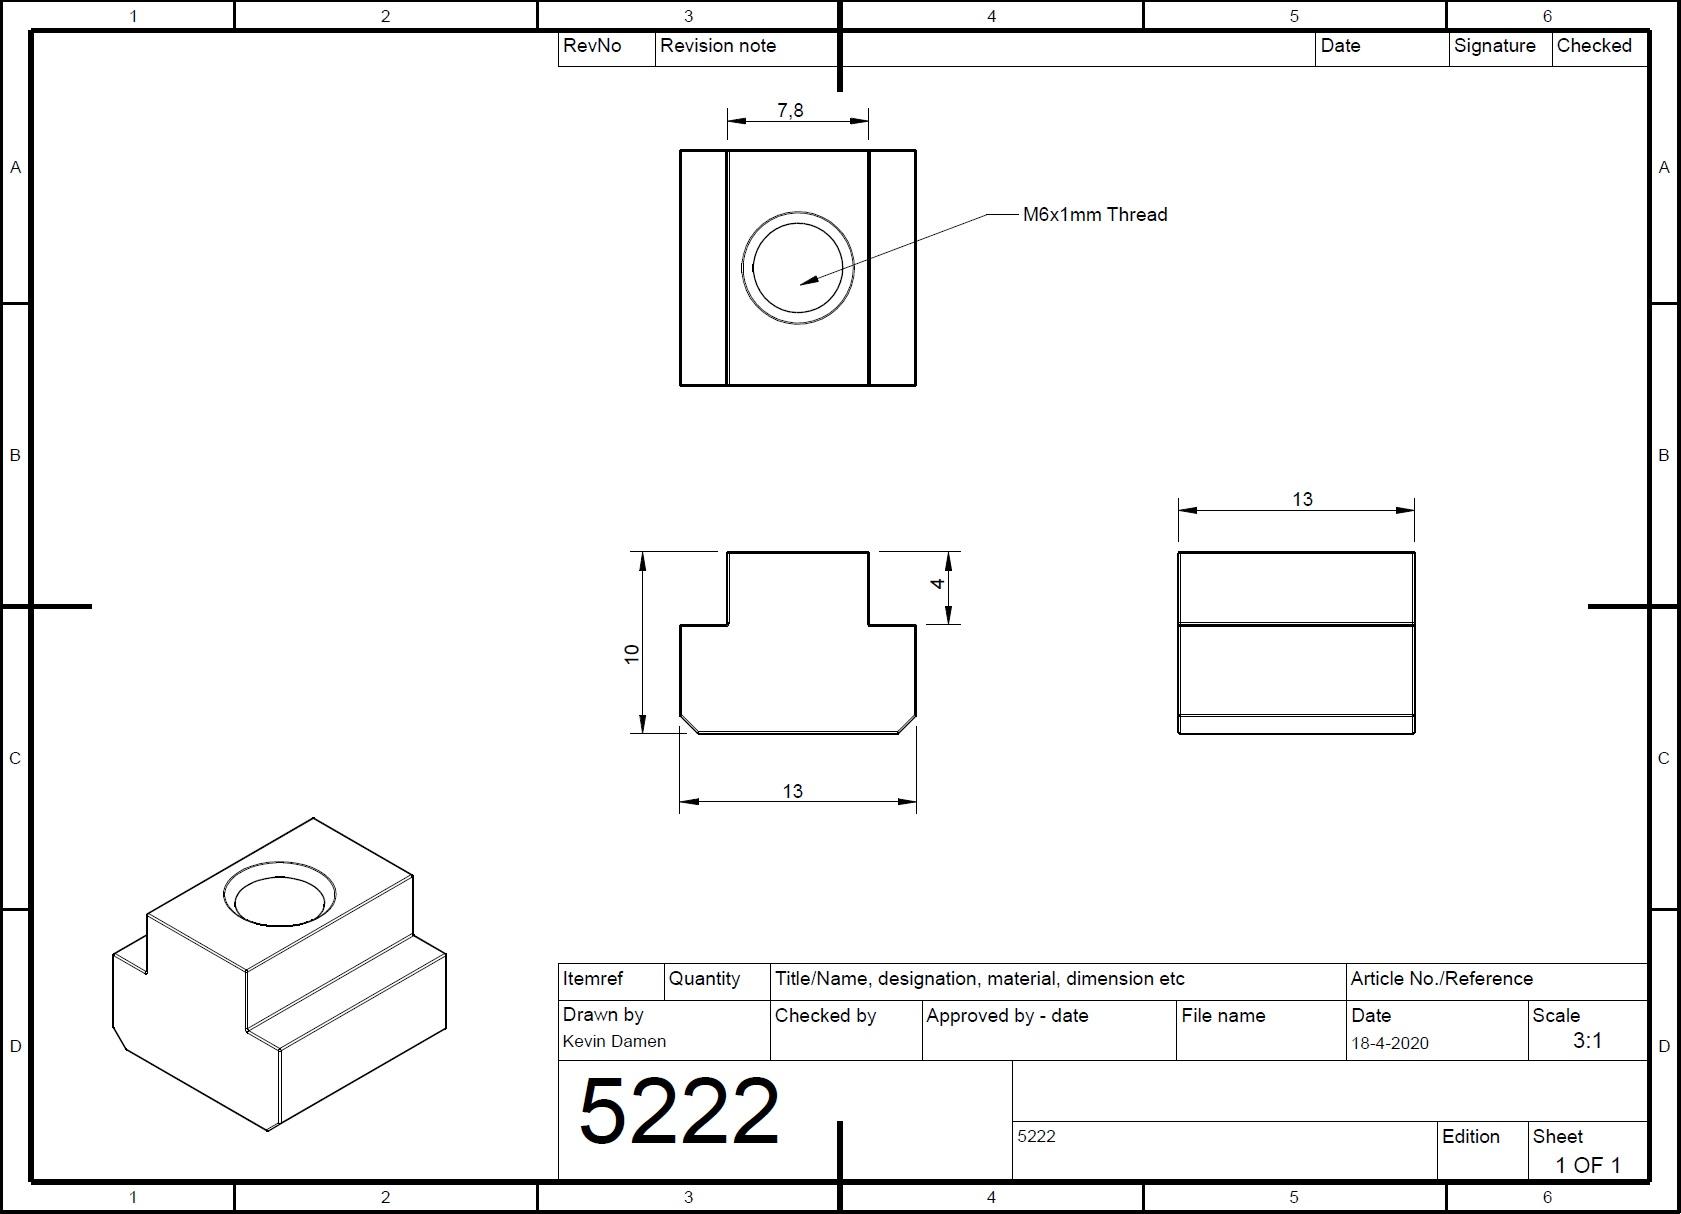 52222 m6 tnut l13mm din508 for tslot8mm wide 2d dimensions